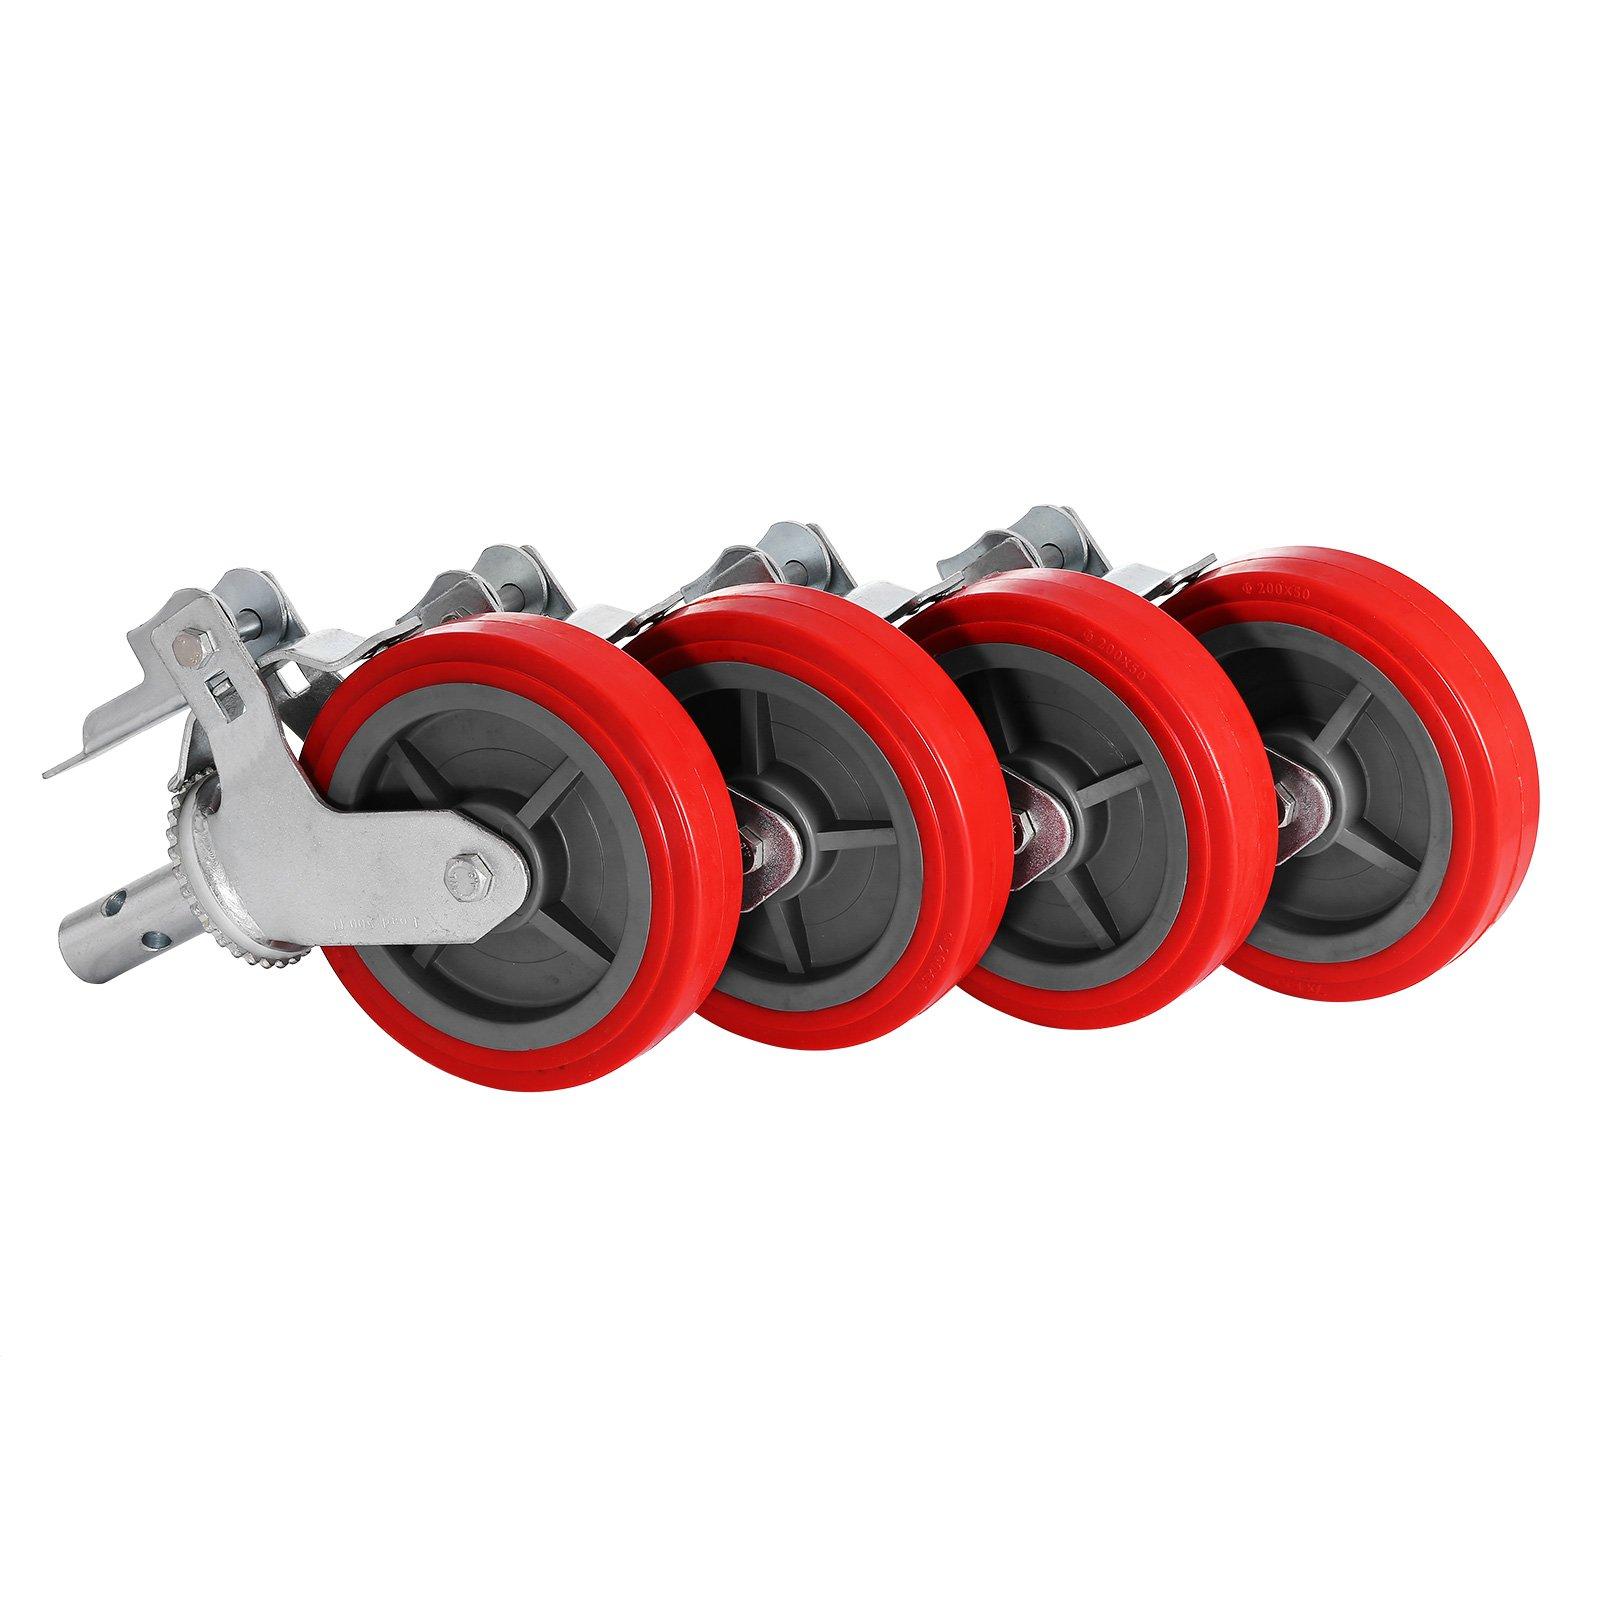 Geindus Set Of 4 Scaffolding Casters Polyurethane 600LBS Scaffolding Wheels Scaffold Caster Wheel On Iron With Brake Lock